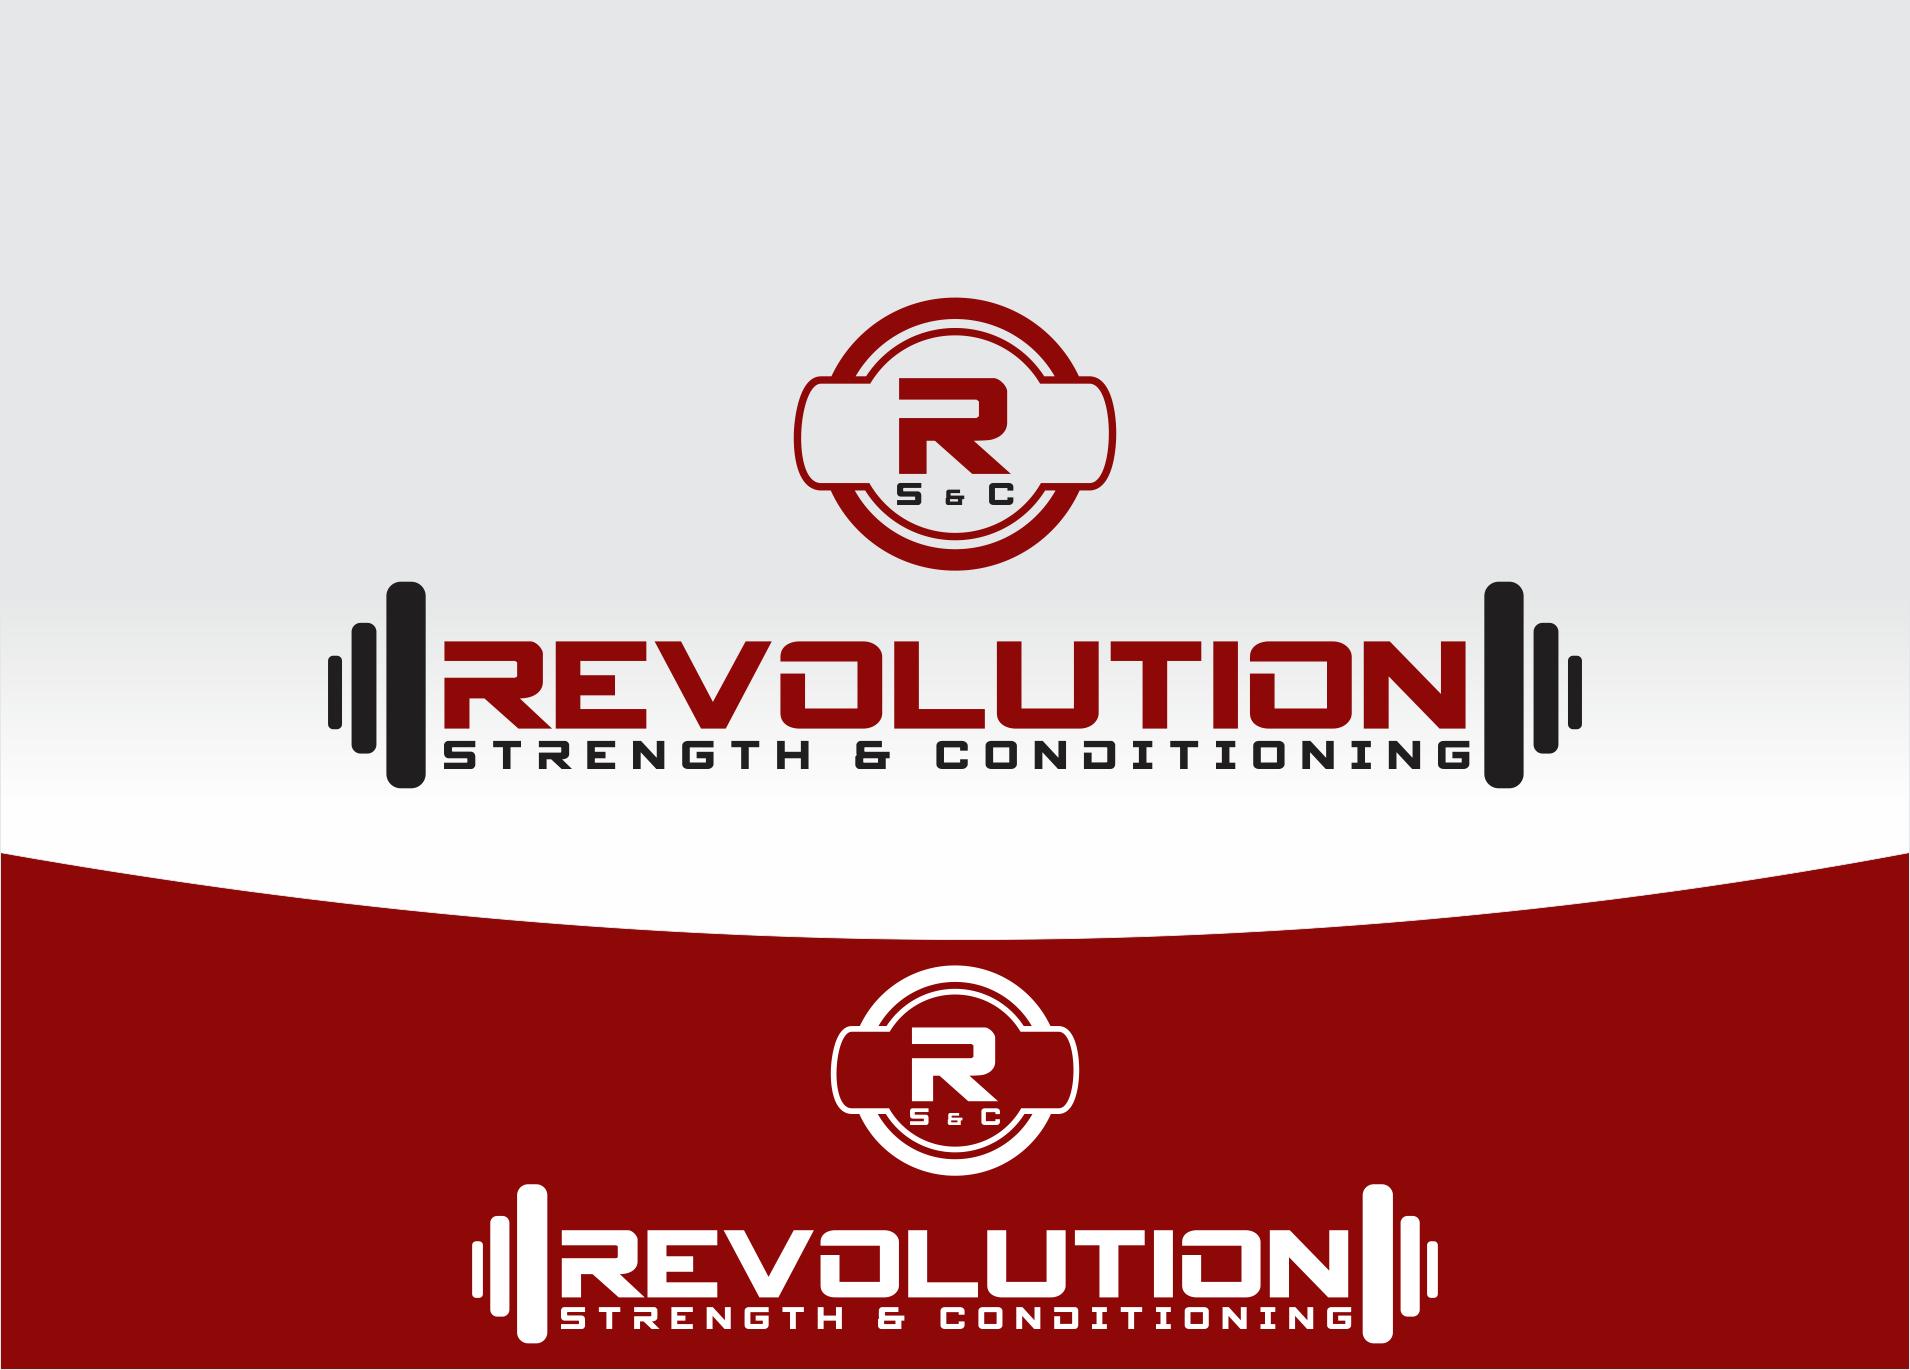 logo for Revolution Strength & Conditioning